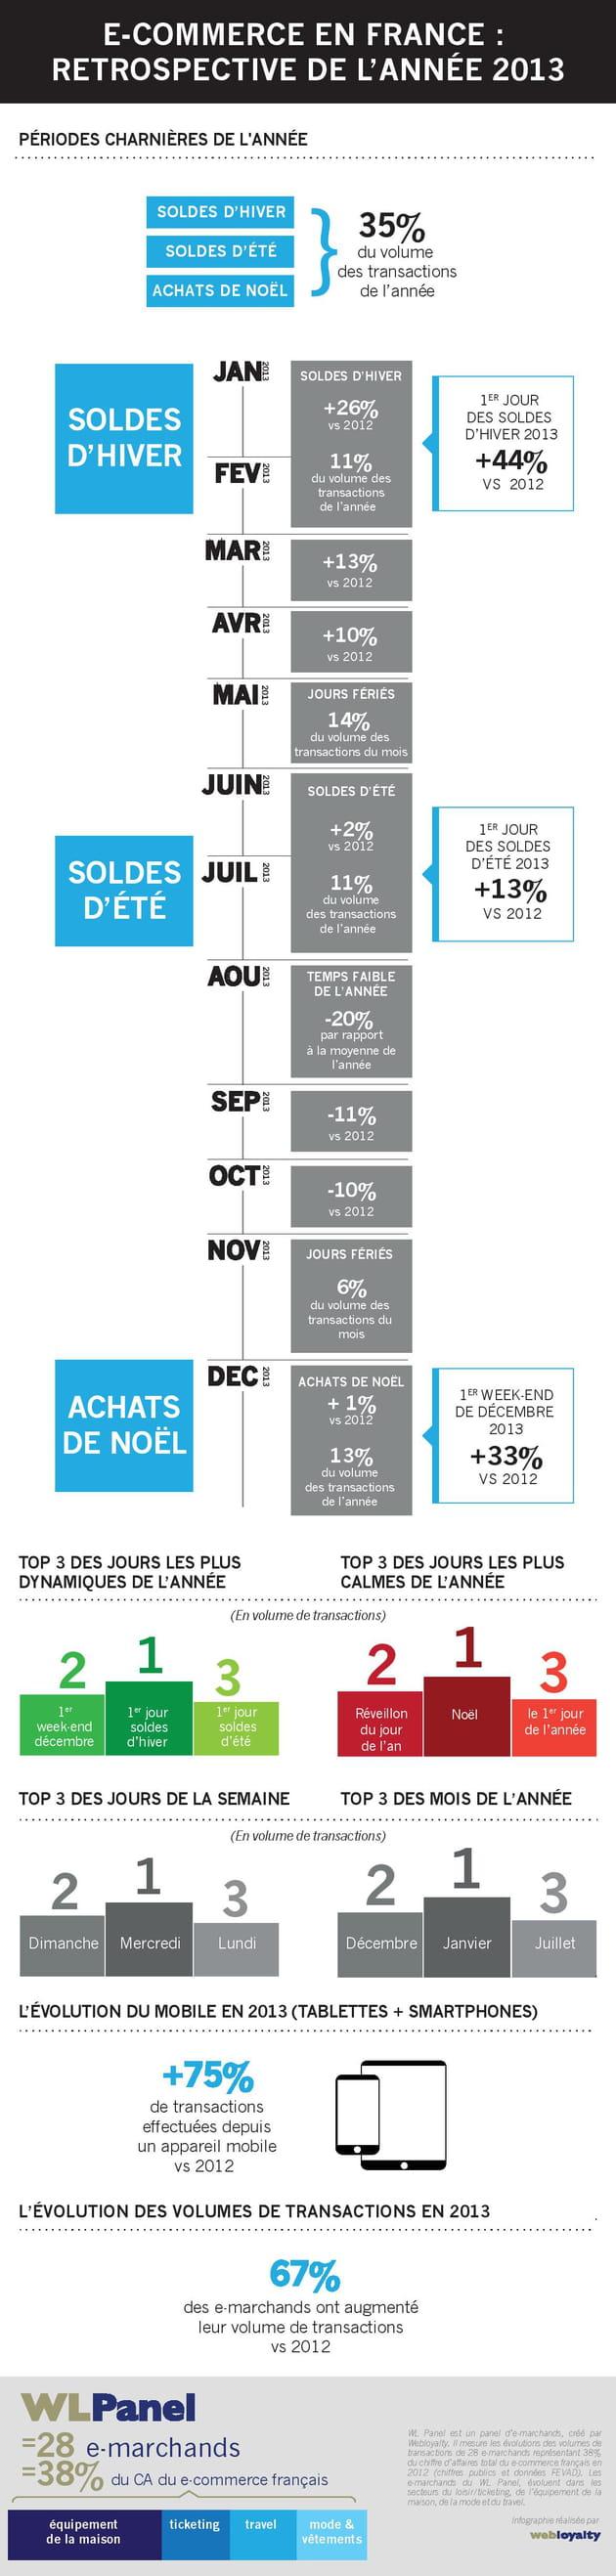 infographie wlpanel bilan ecommerce 2013